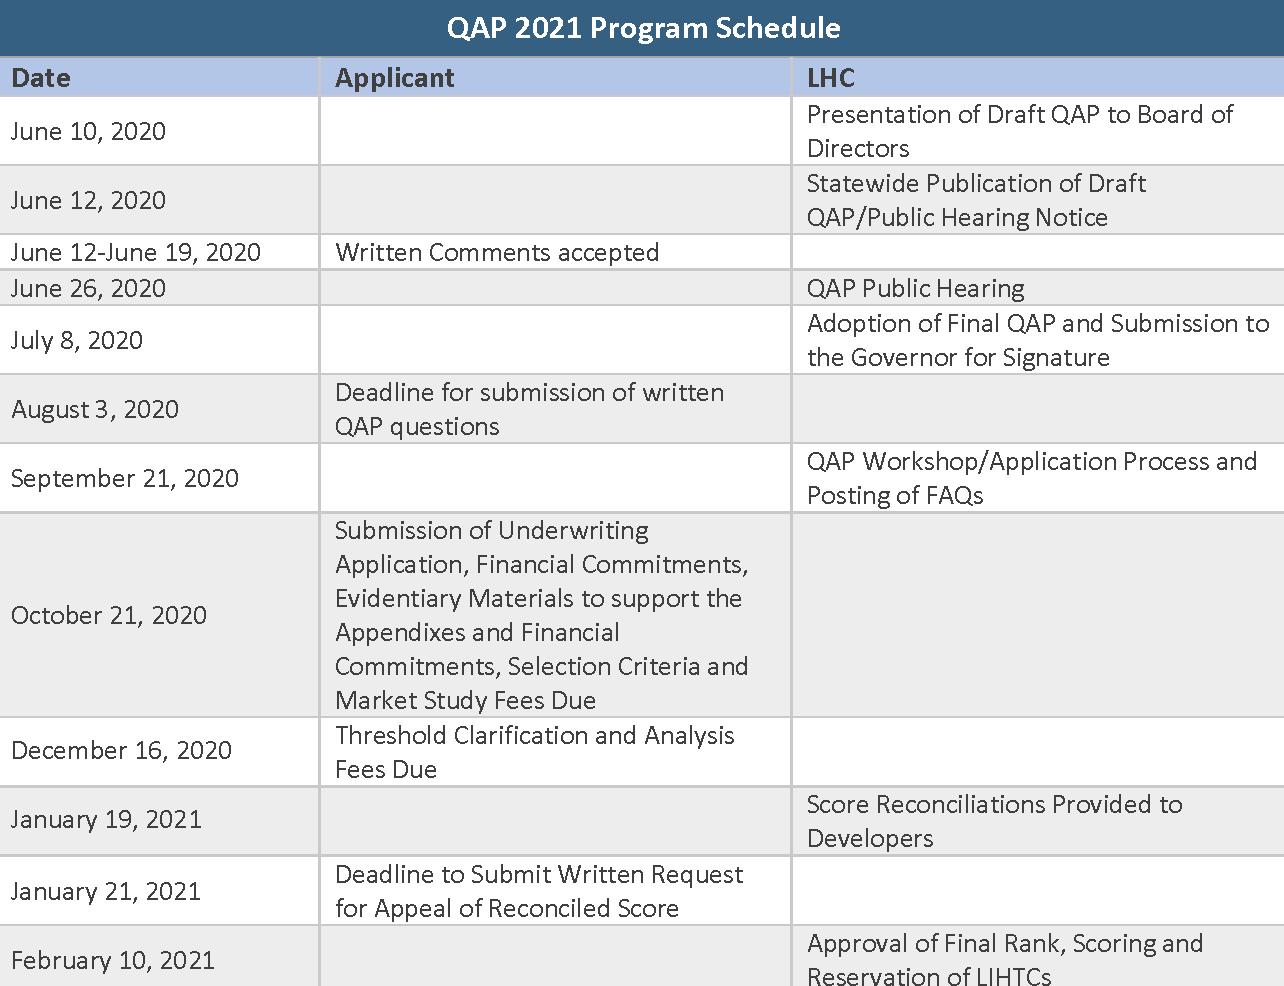 QAP 2021 Program Schedule - Revised